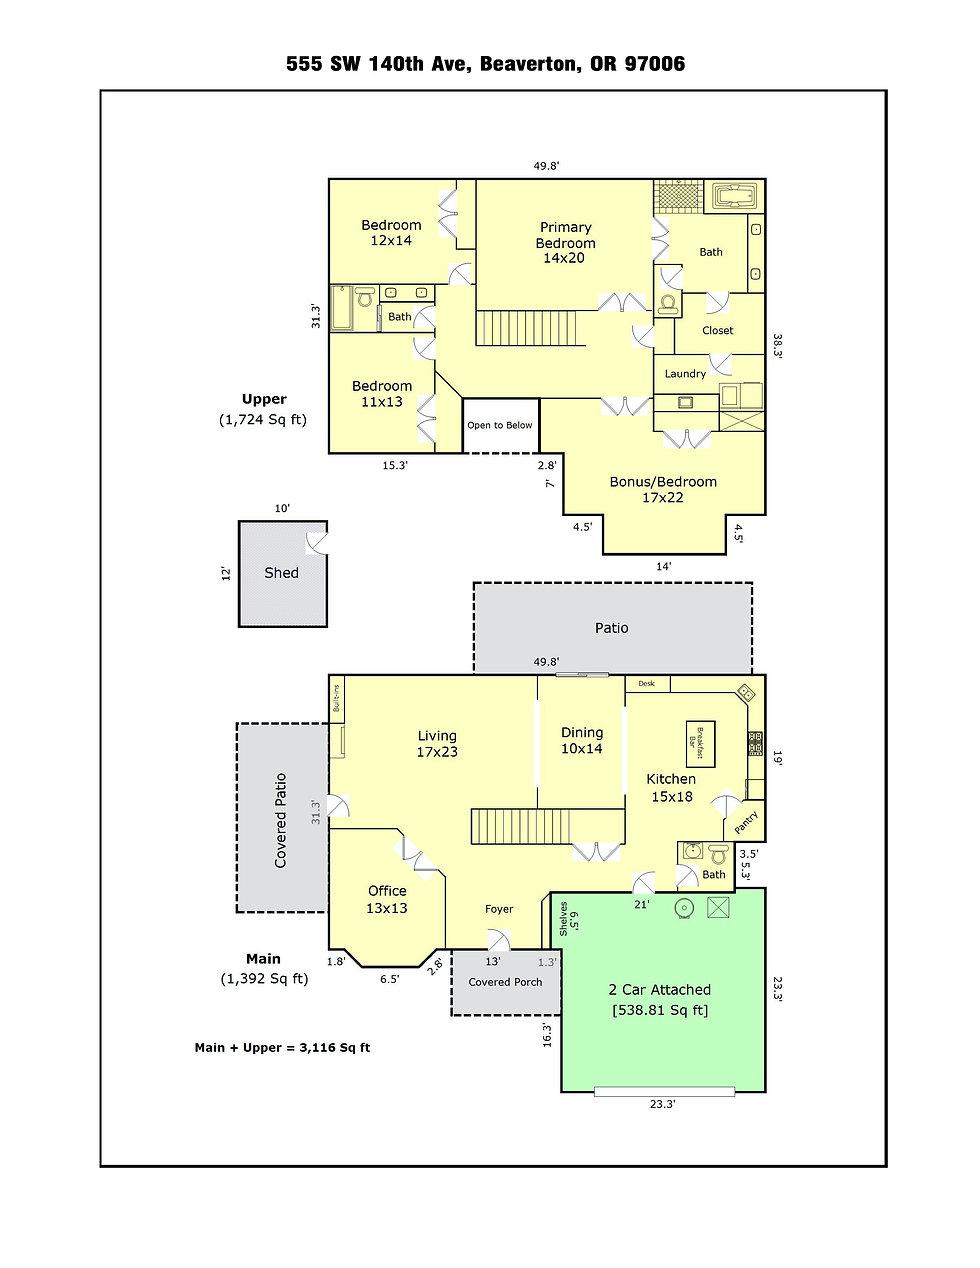 555 SW 140th Ave Floor Plan-1.jpg